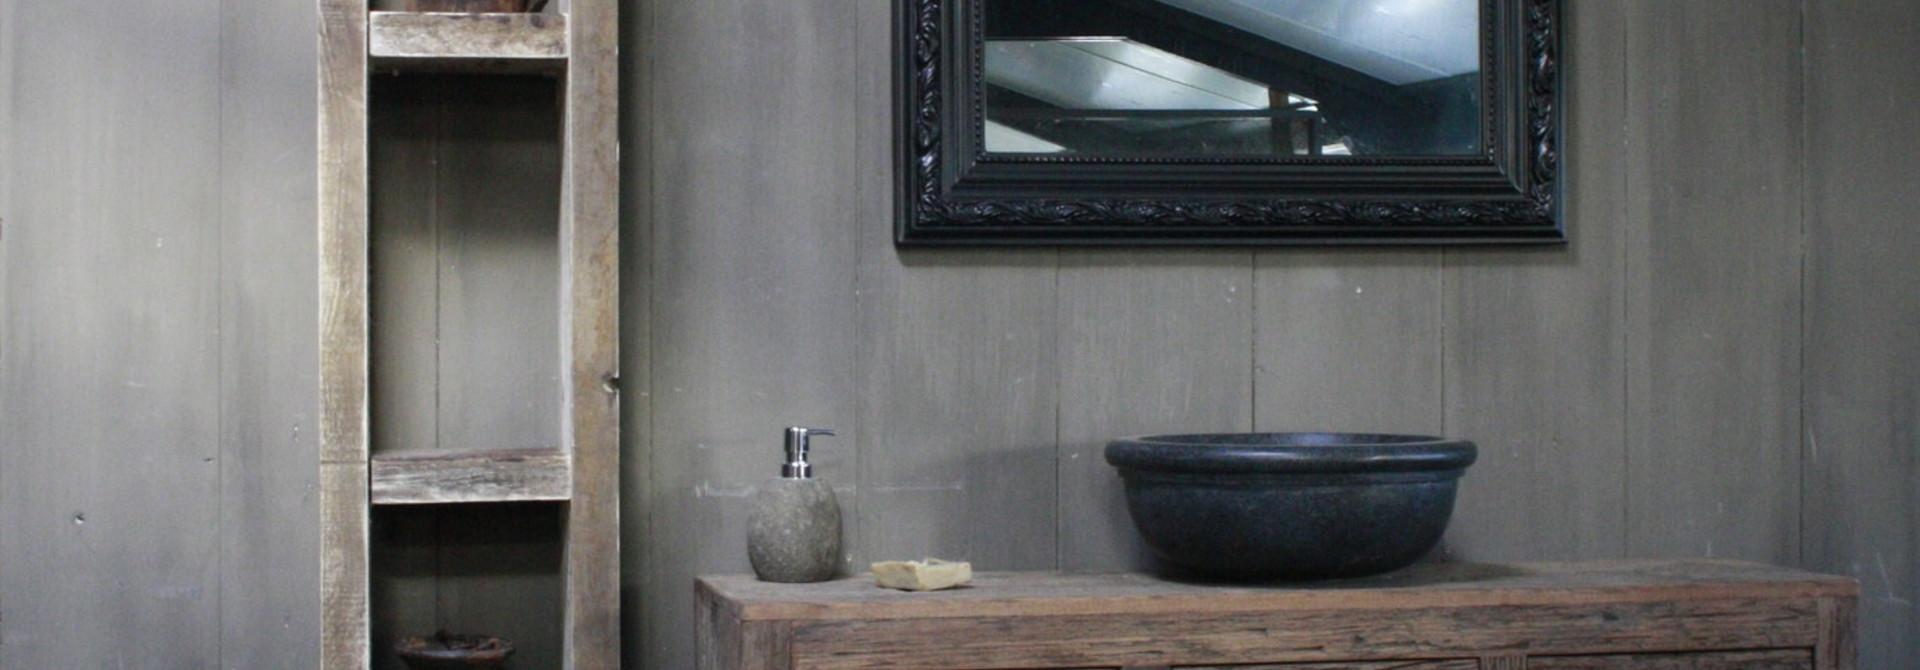 Metalen, houten en glazen spiegels.